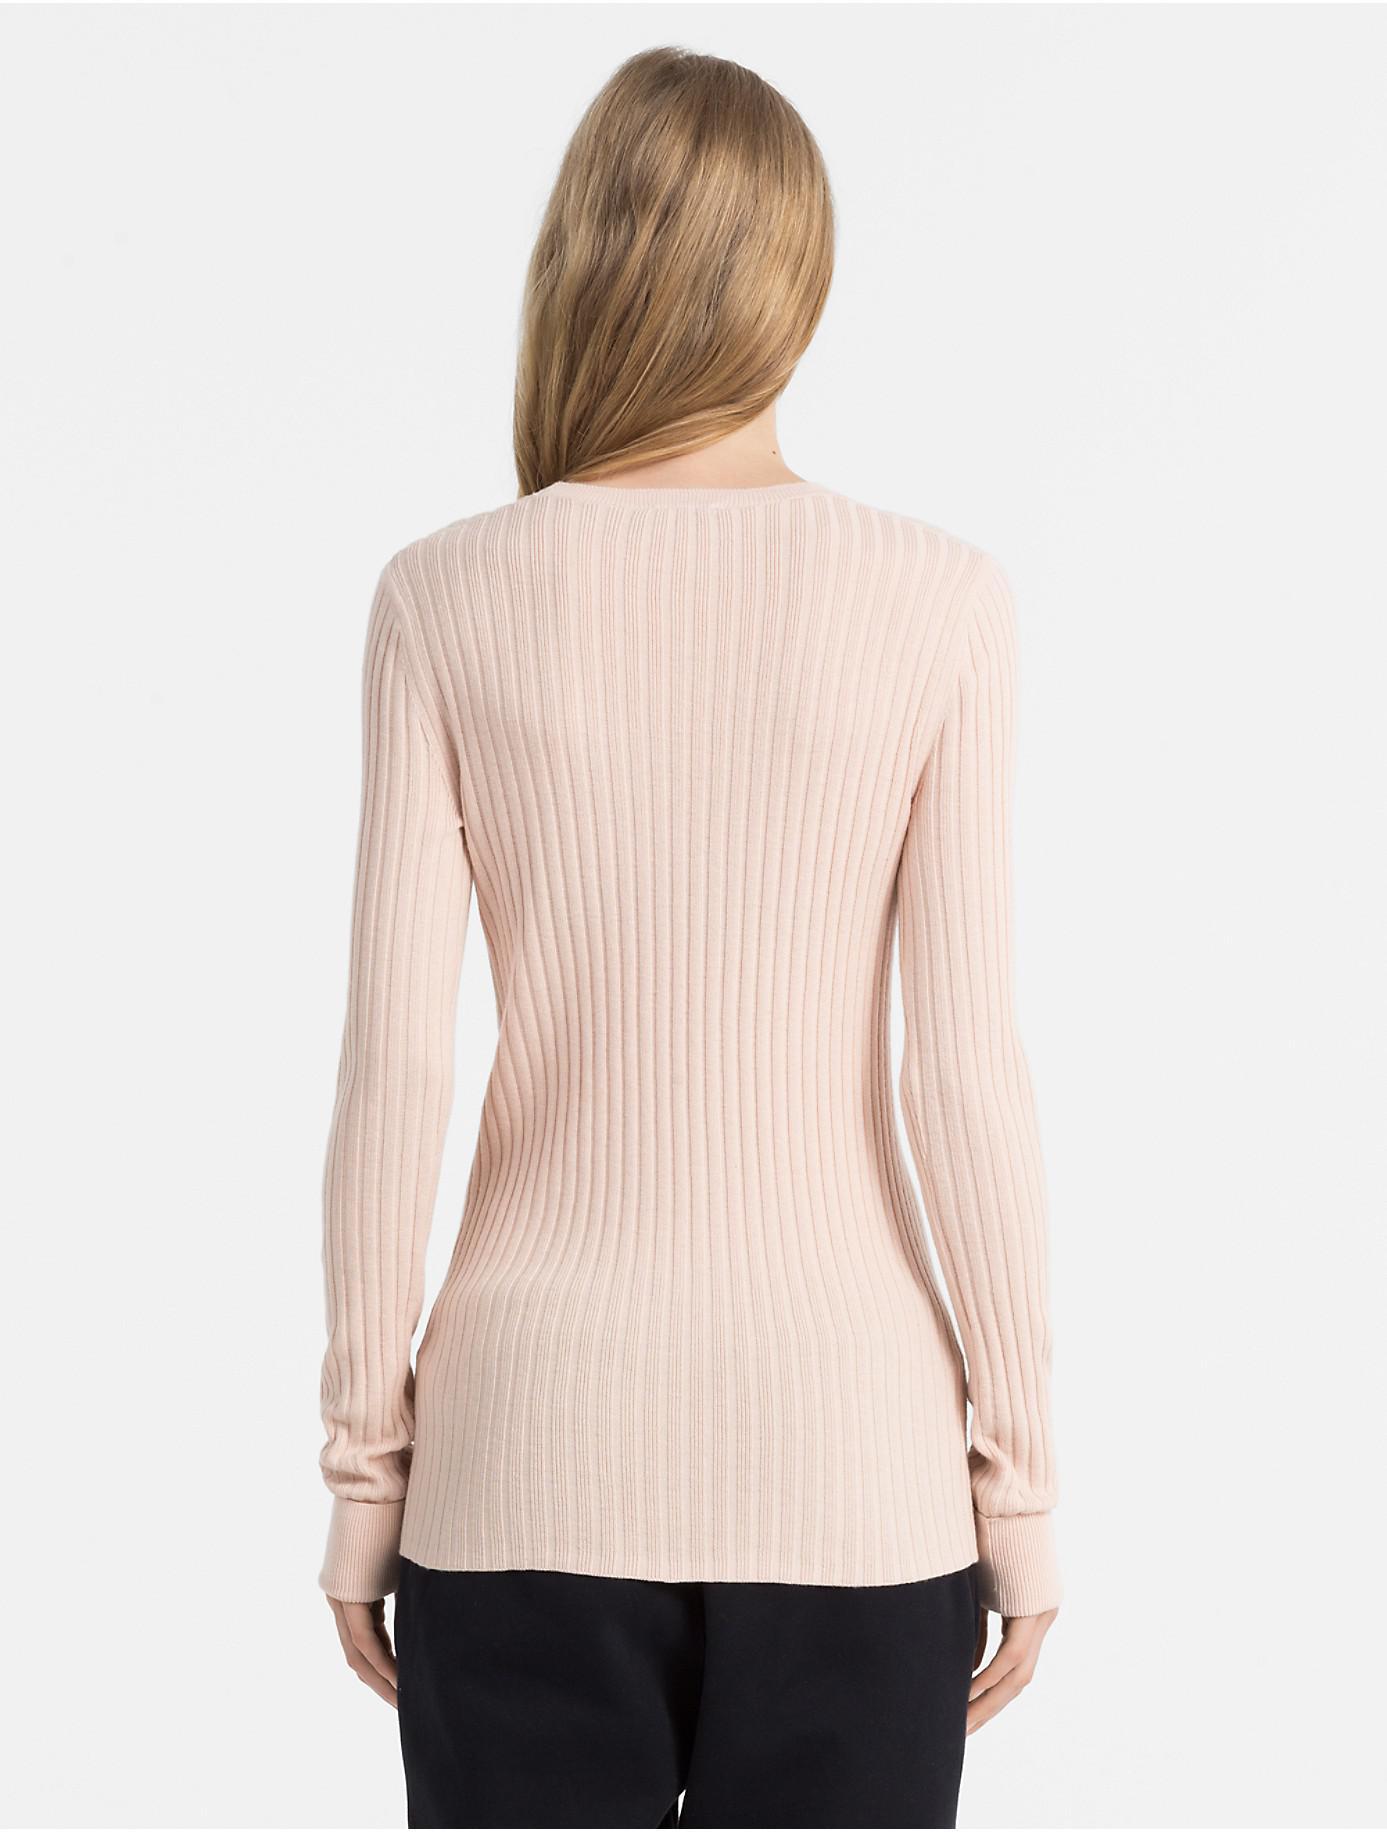 b6a141d09 Lyst - Calvin Klein Slim Fit Cotton Silk Rib Sweater